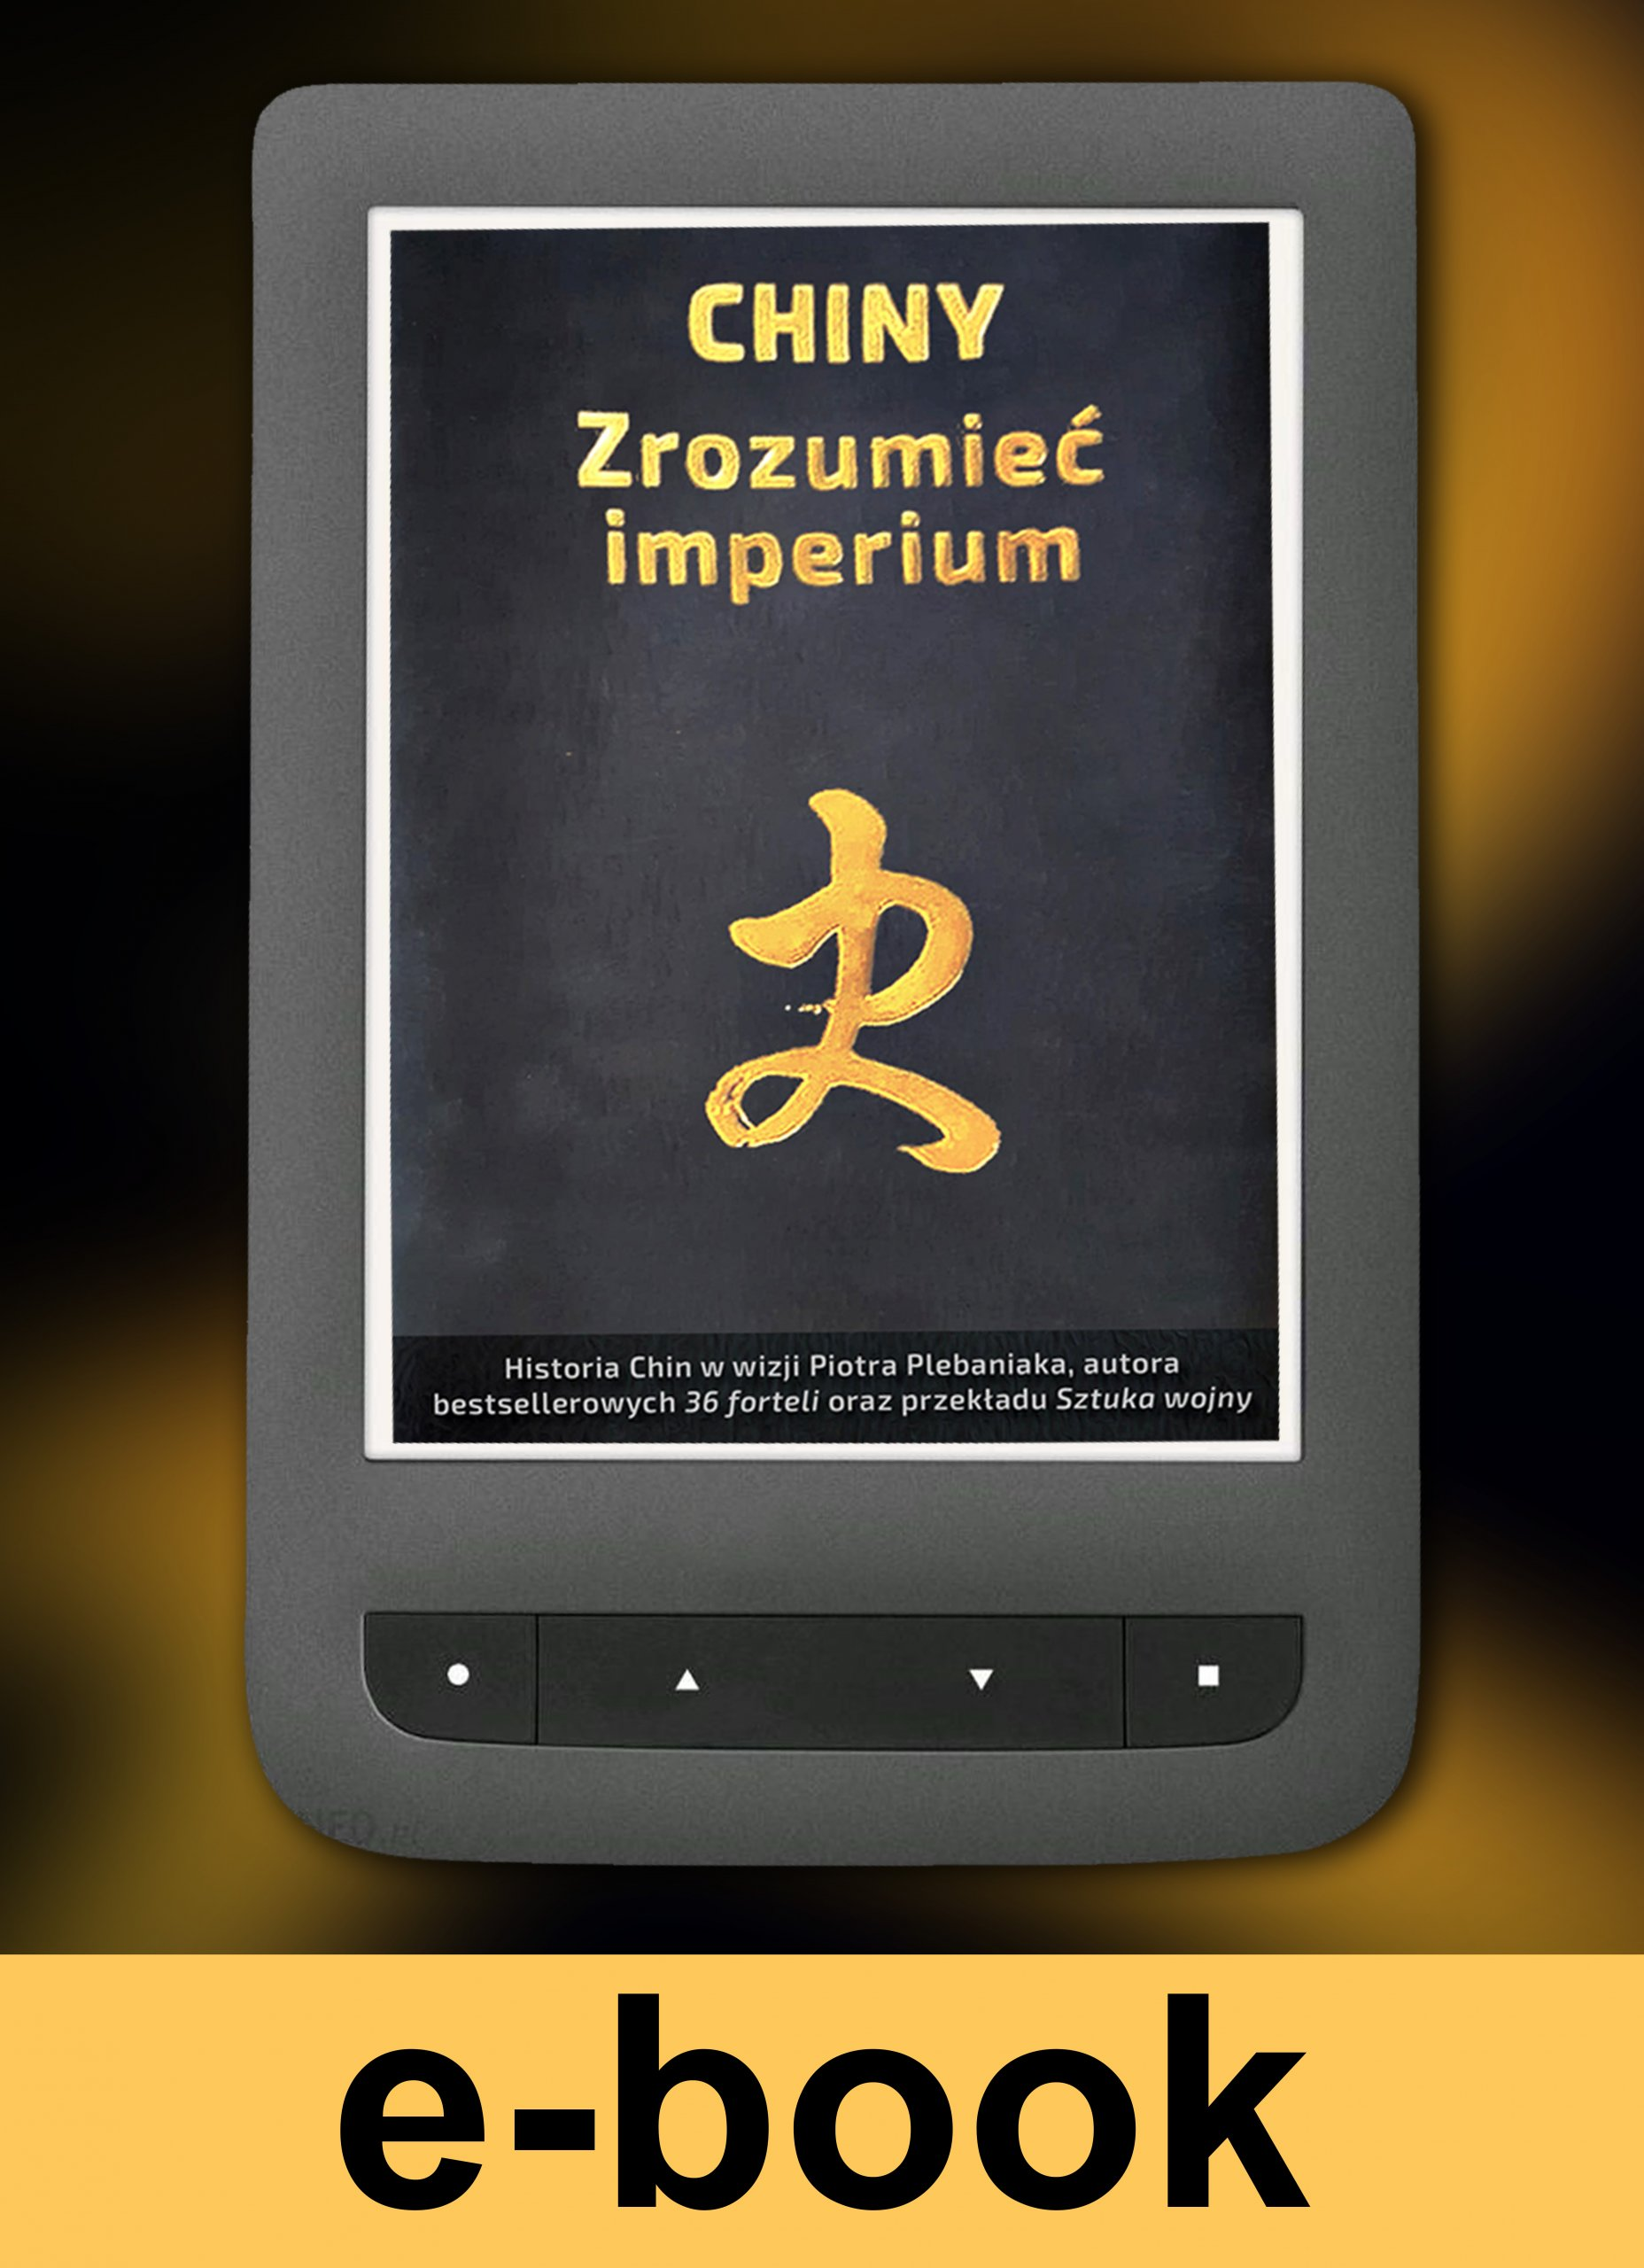 Chiny. Zrozumieć imperium (e-book)